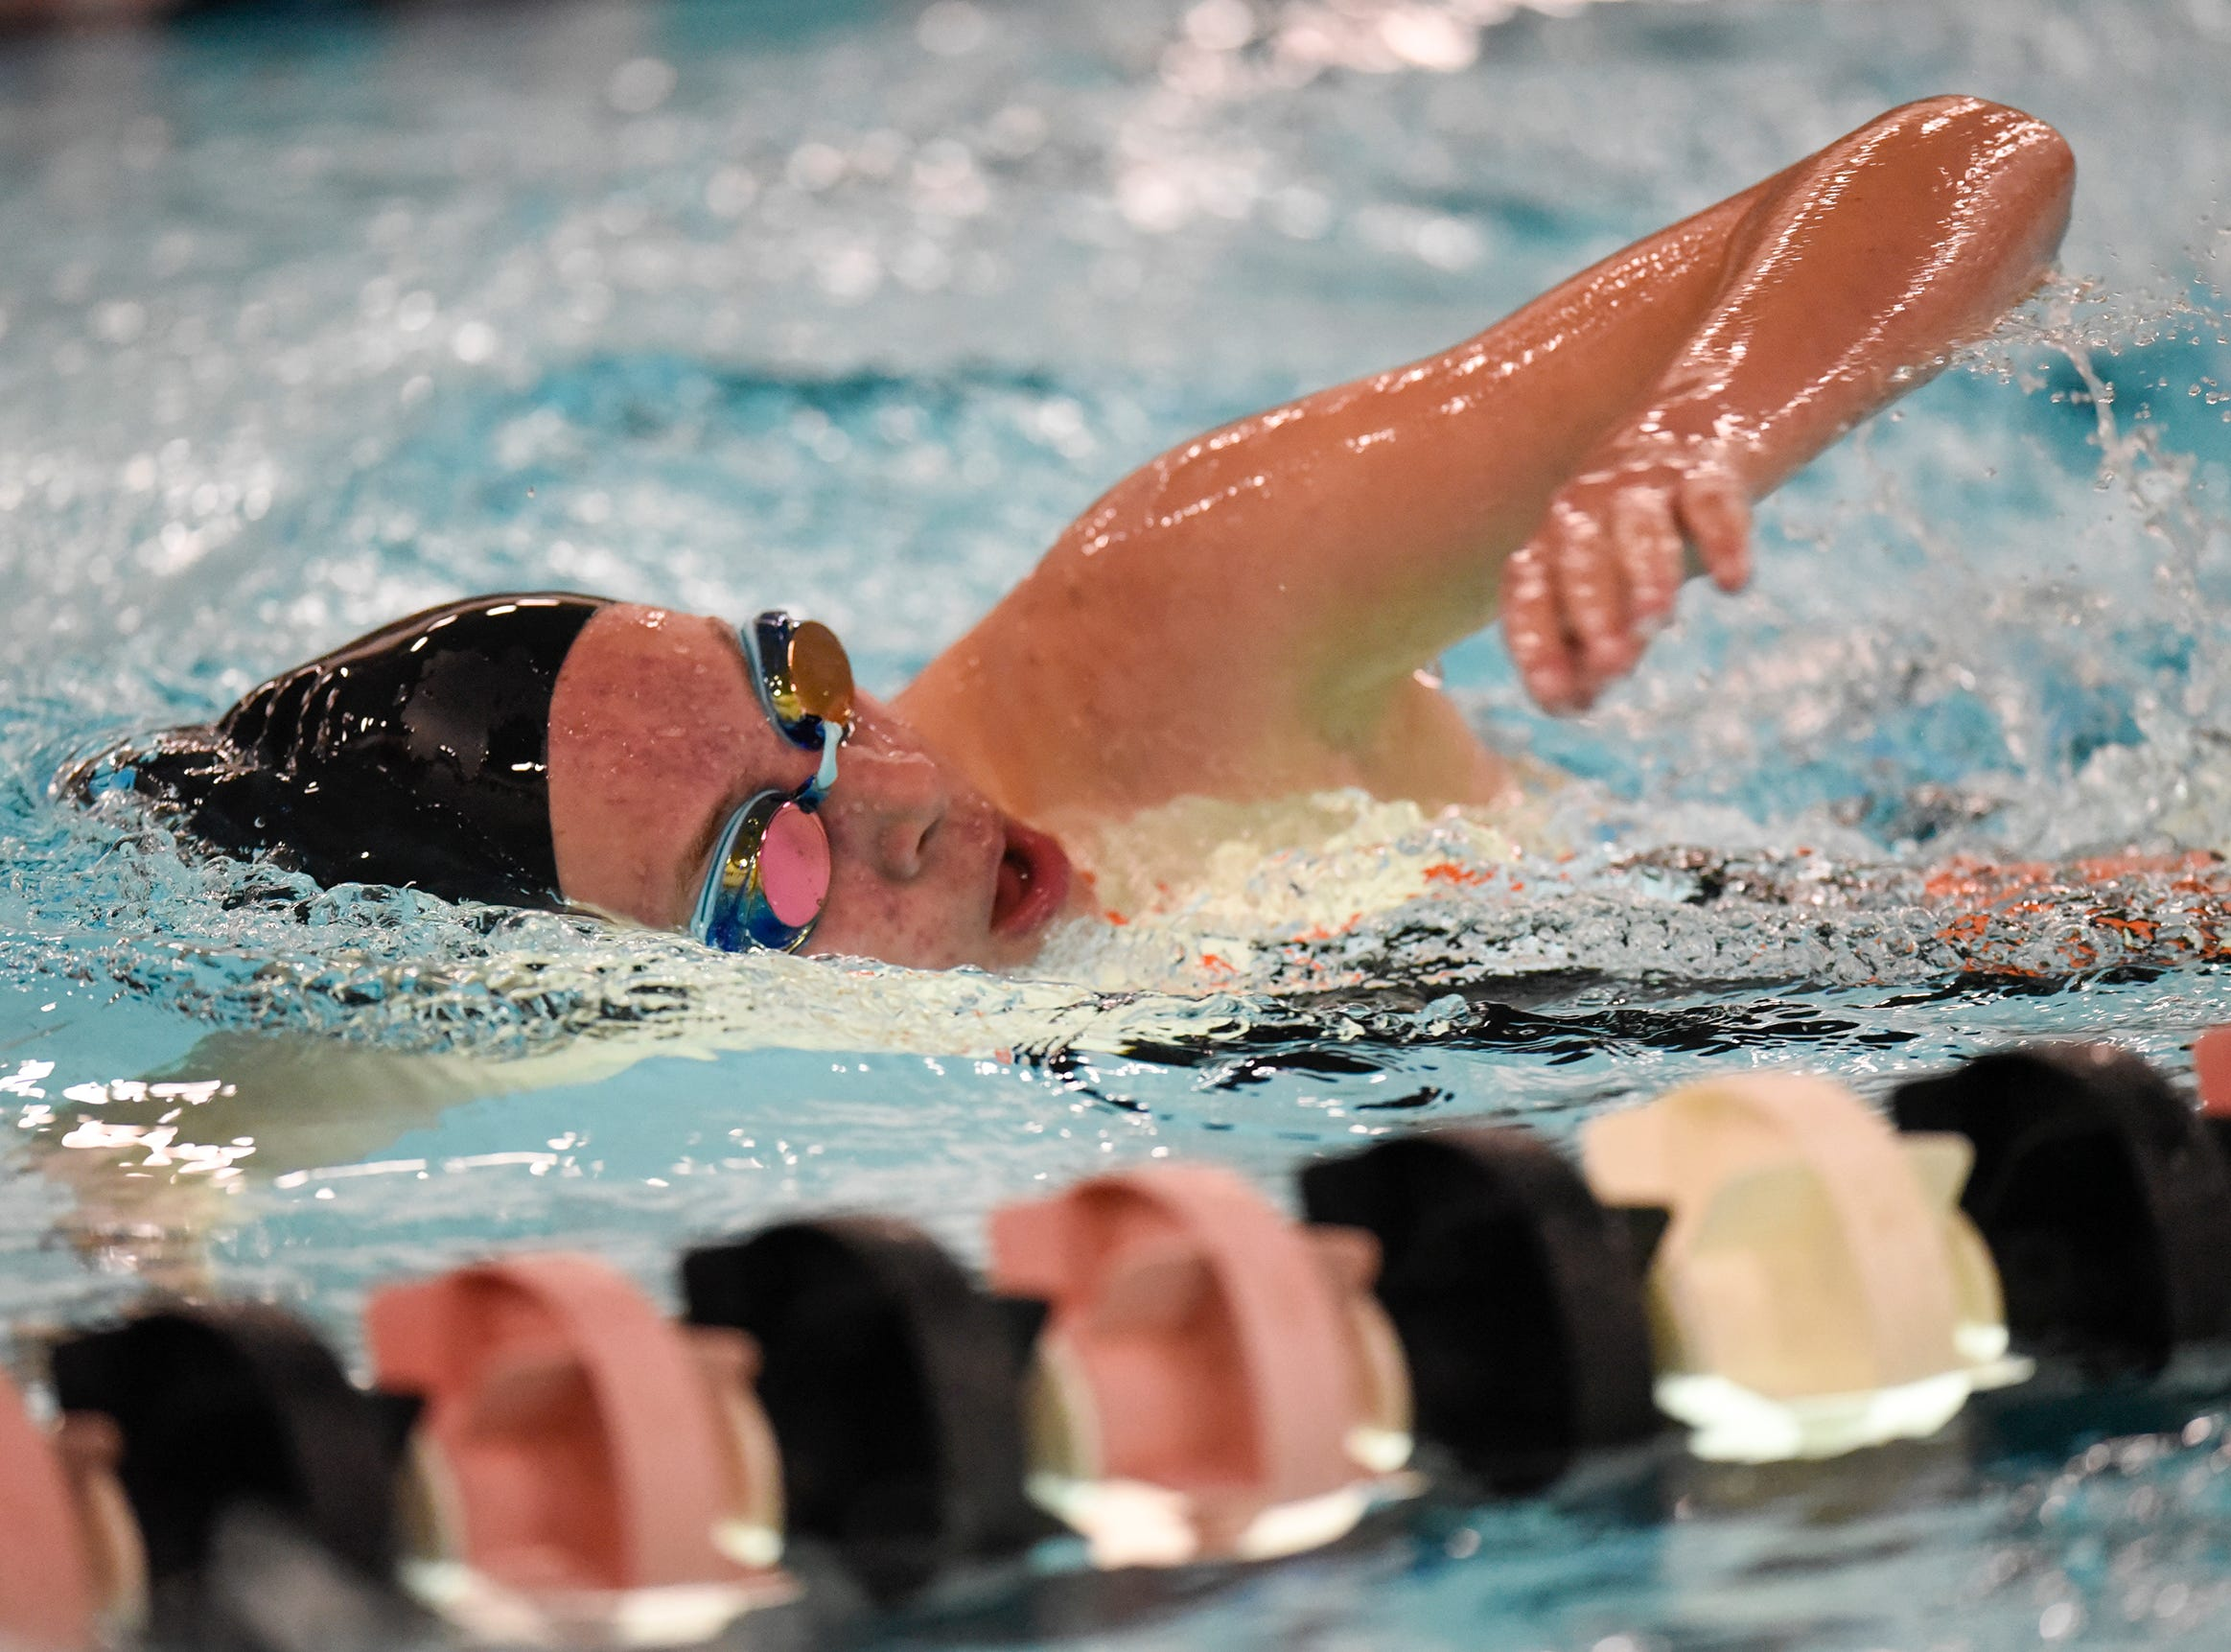 Brielle Tesmer swims during the Tuesday, Sept. 18 meet against Buffalo at Tech High School in St. Cloud.